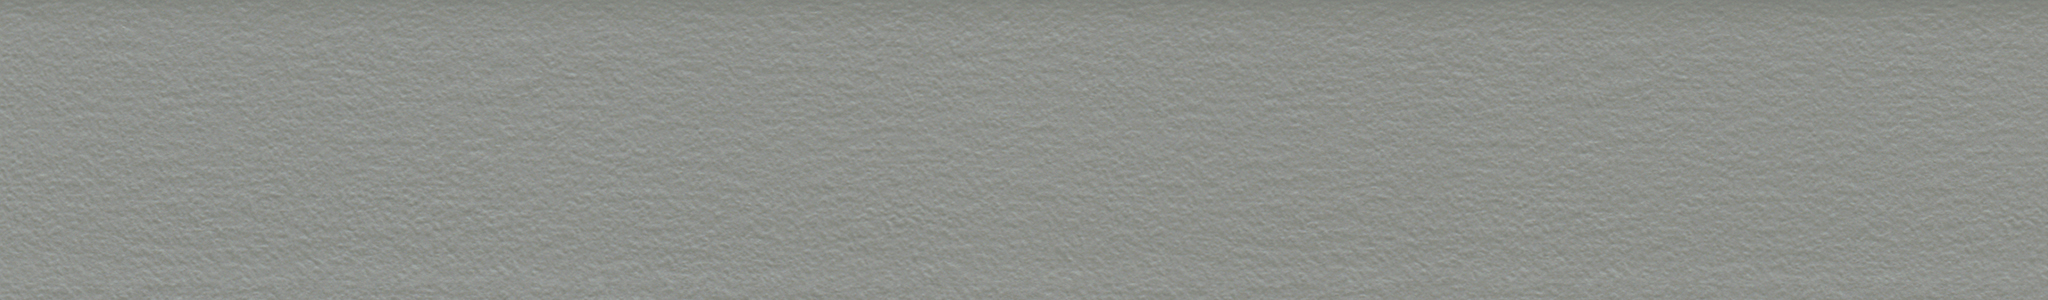 HU 17008 ABS-rand grijs fijne parel 107